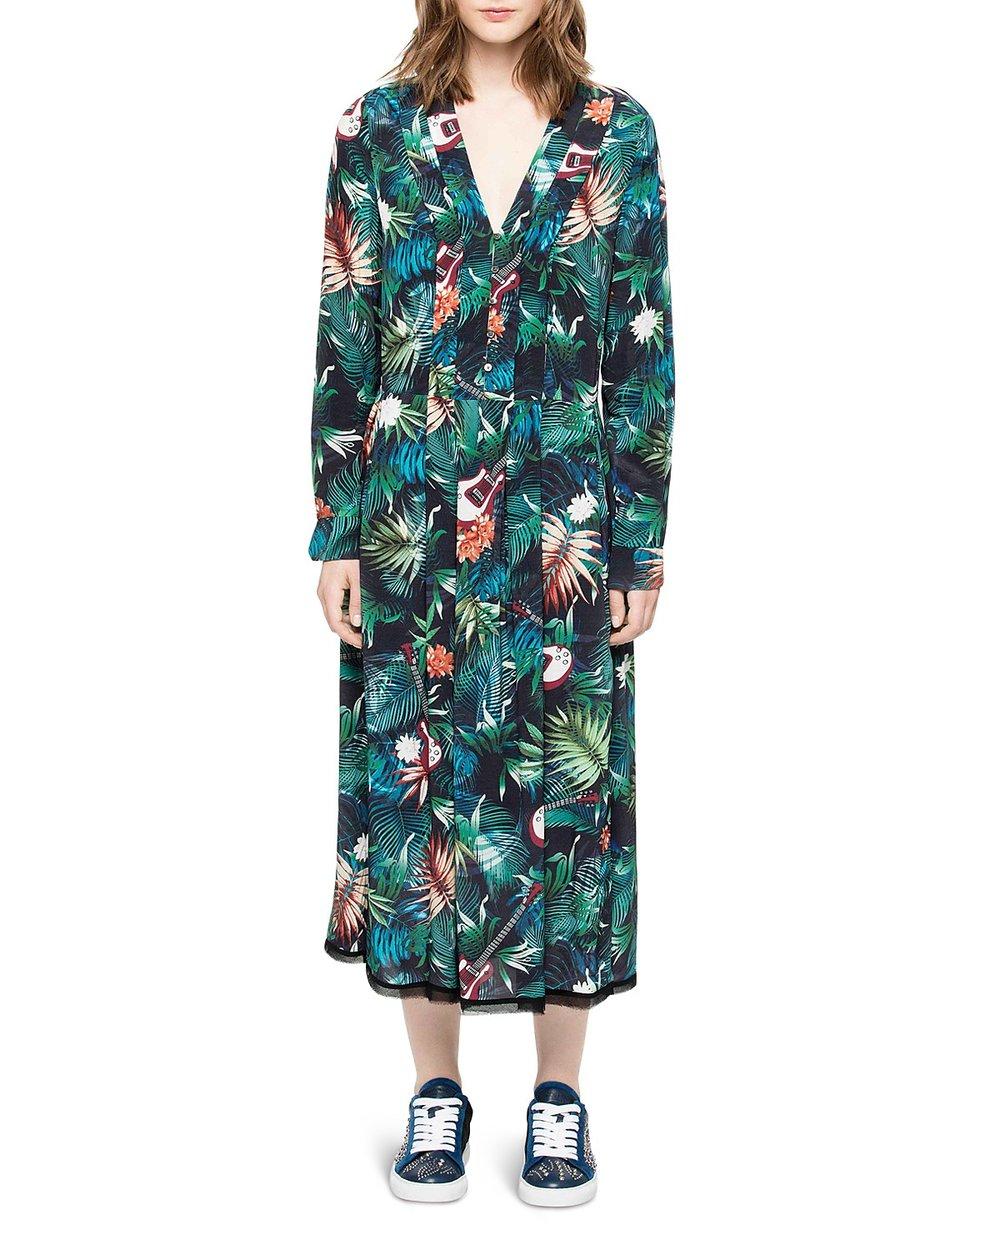 - ROUX JUNGLE DRESS $468*photo via Bloomingdales